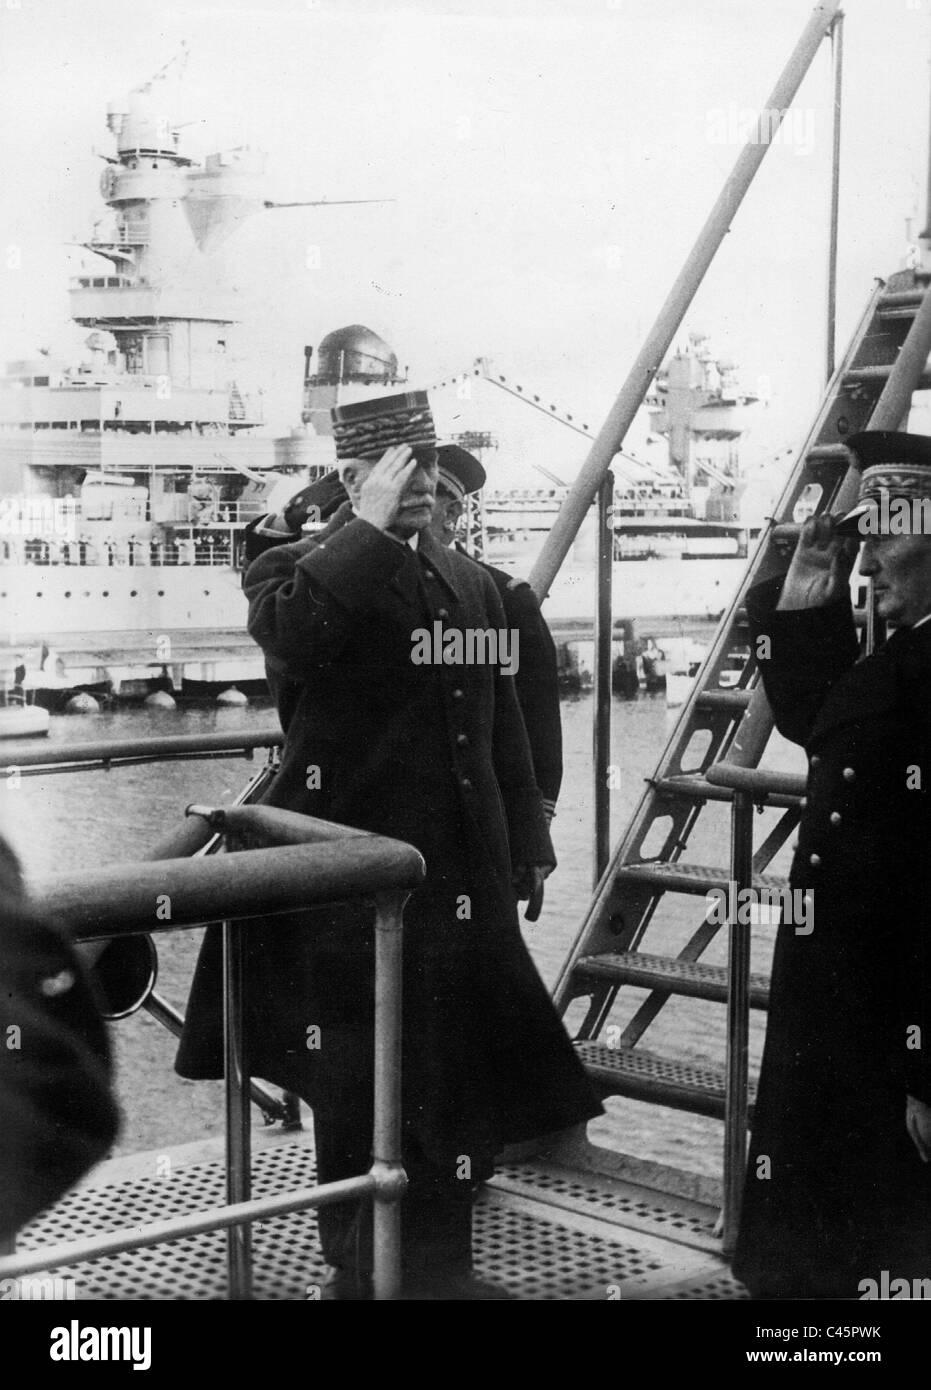 Henri Philippe Petain visits Toulon, 1940 - Stock Image